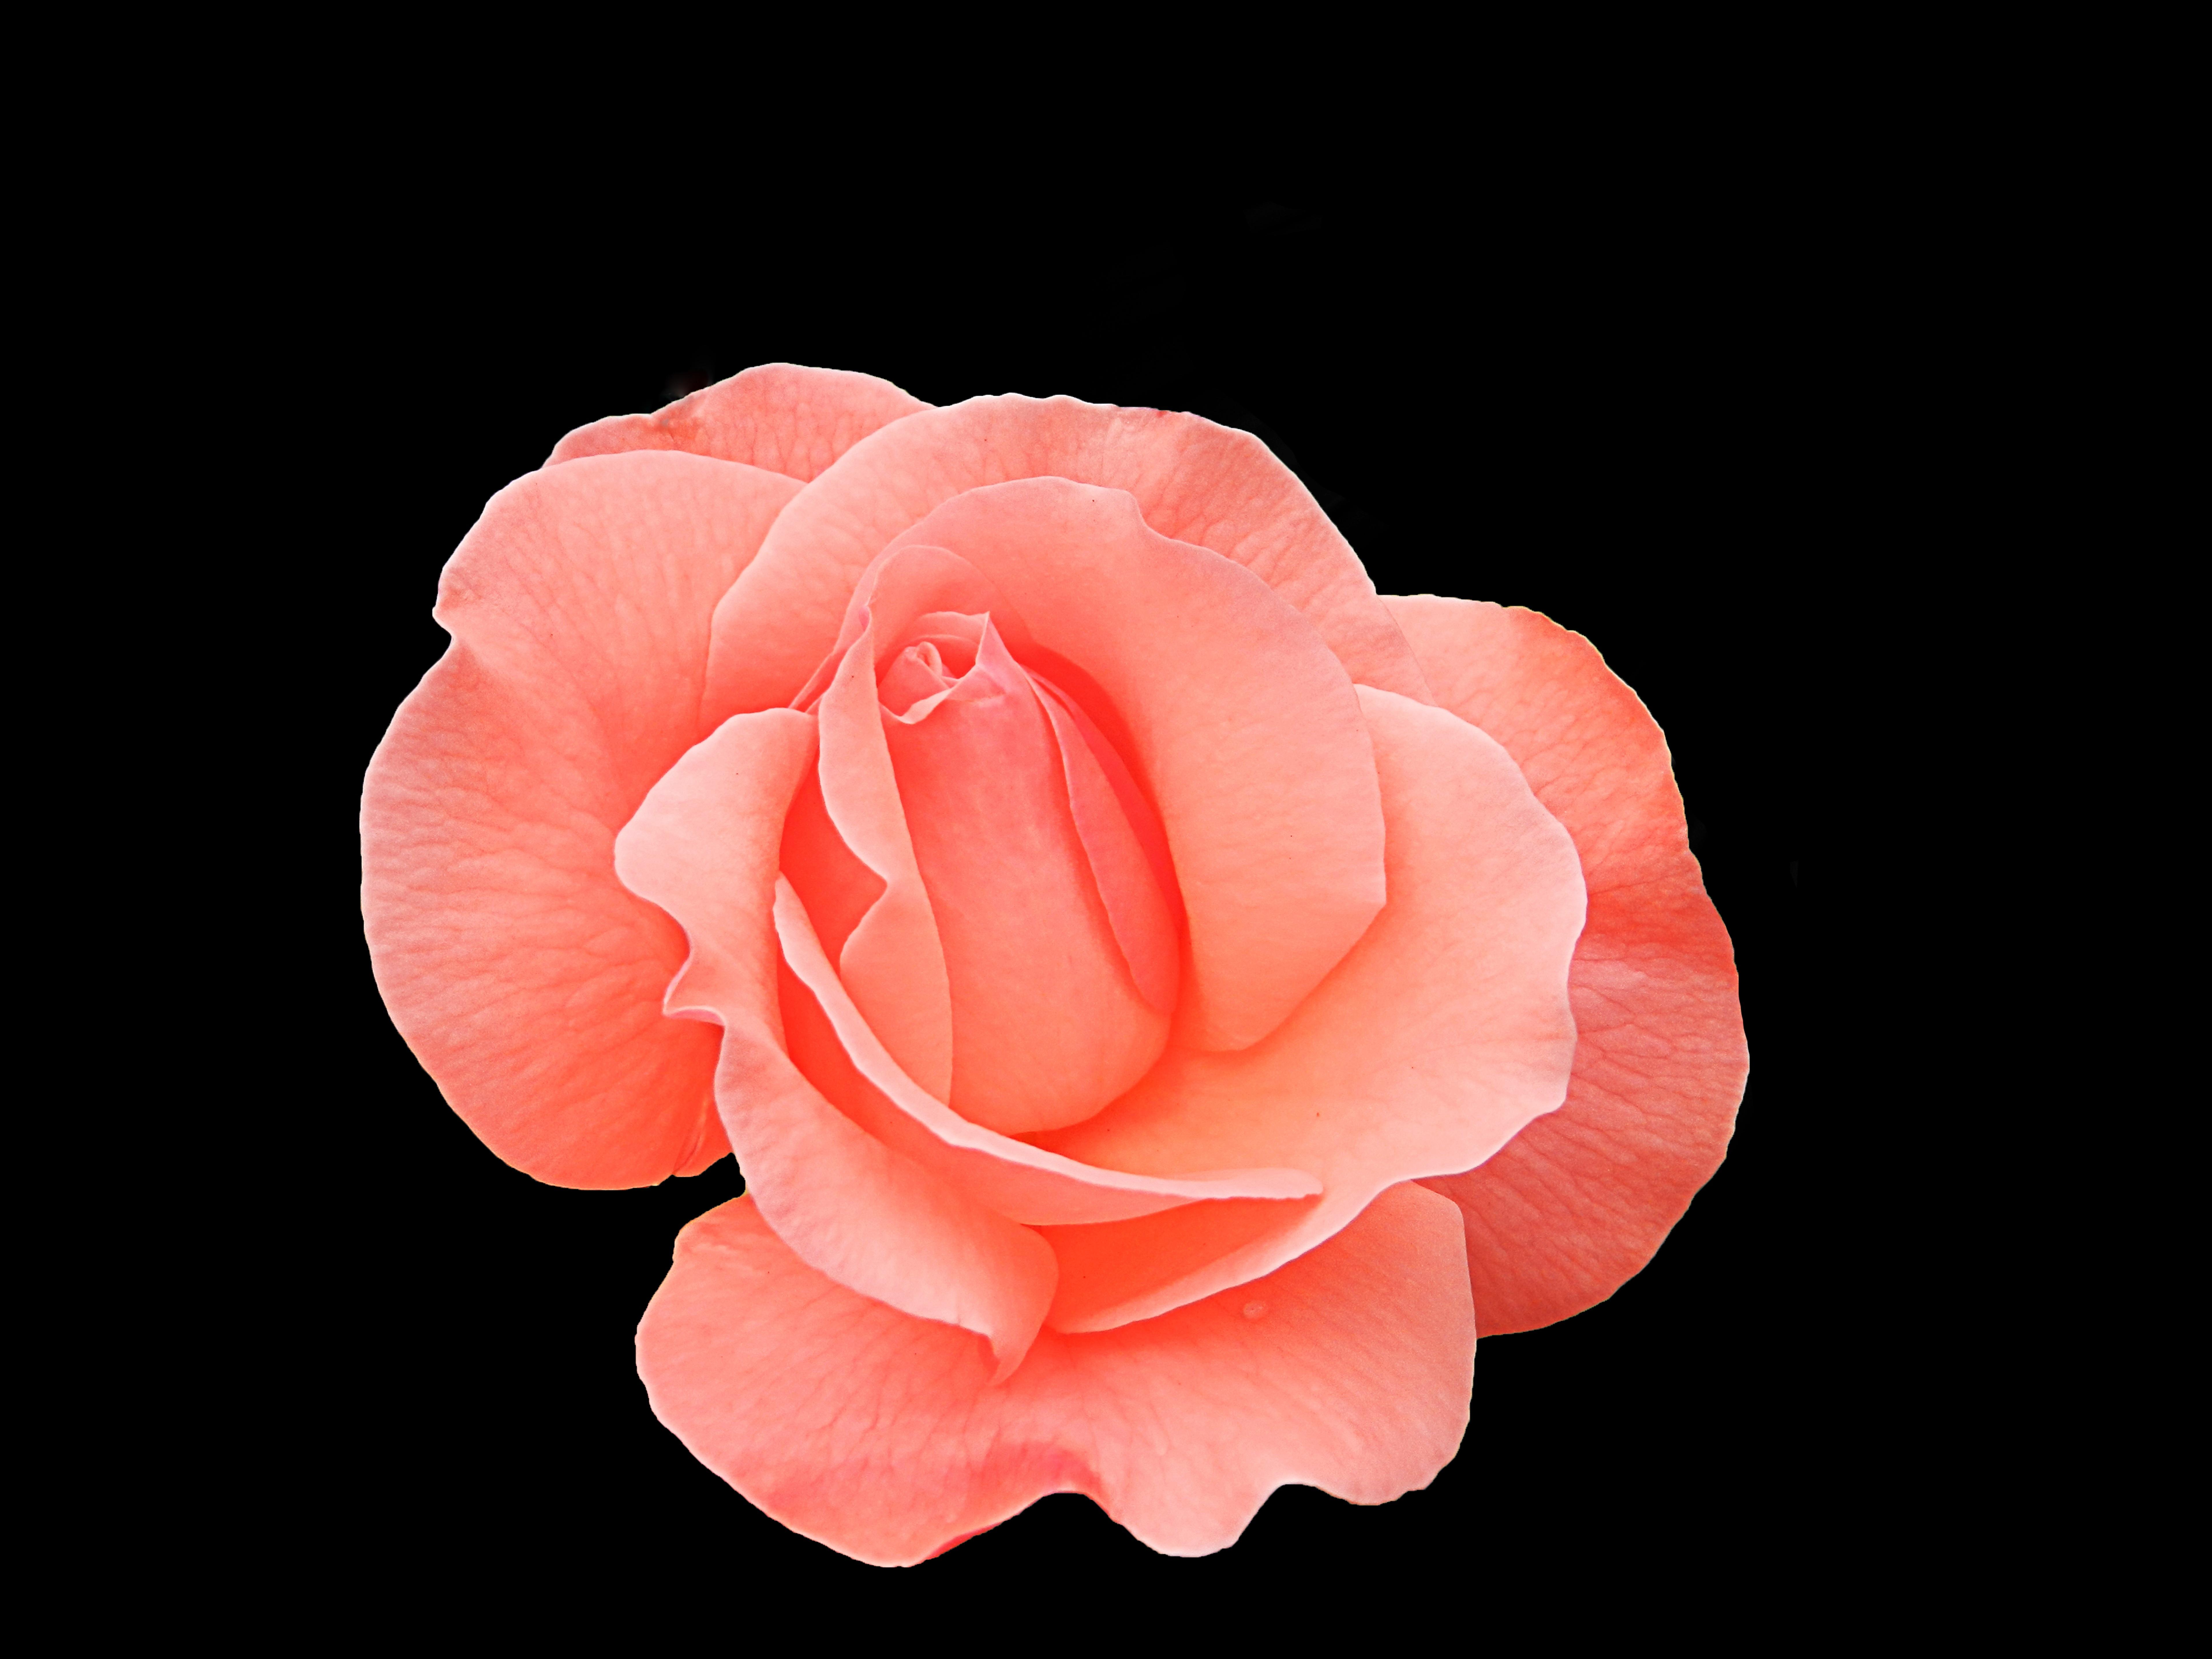 Free Images : nature, blossom, light, flower, petal, interior ...